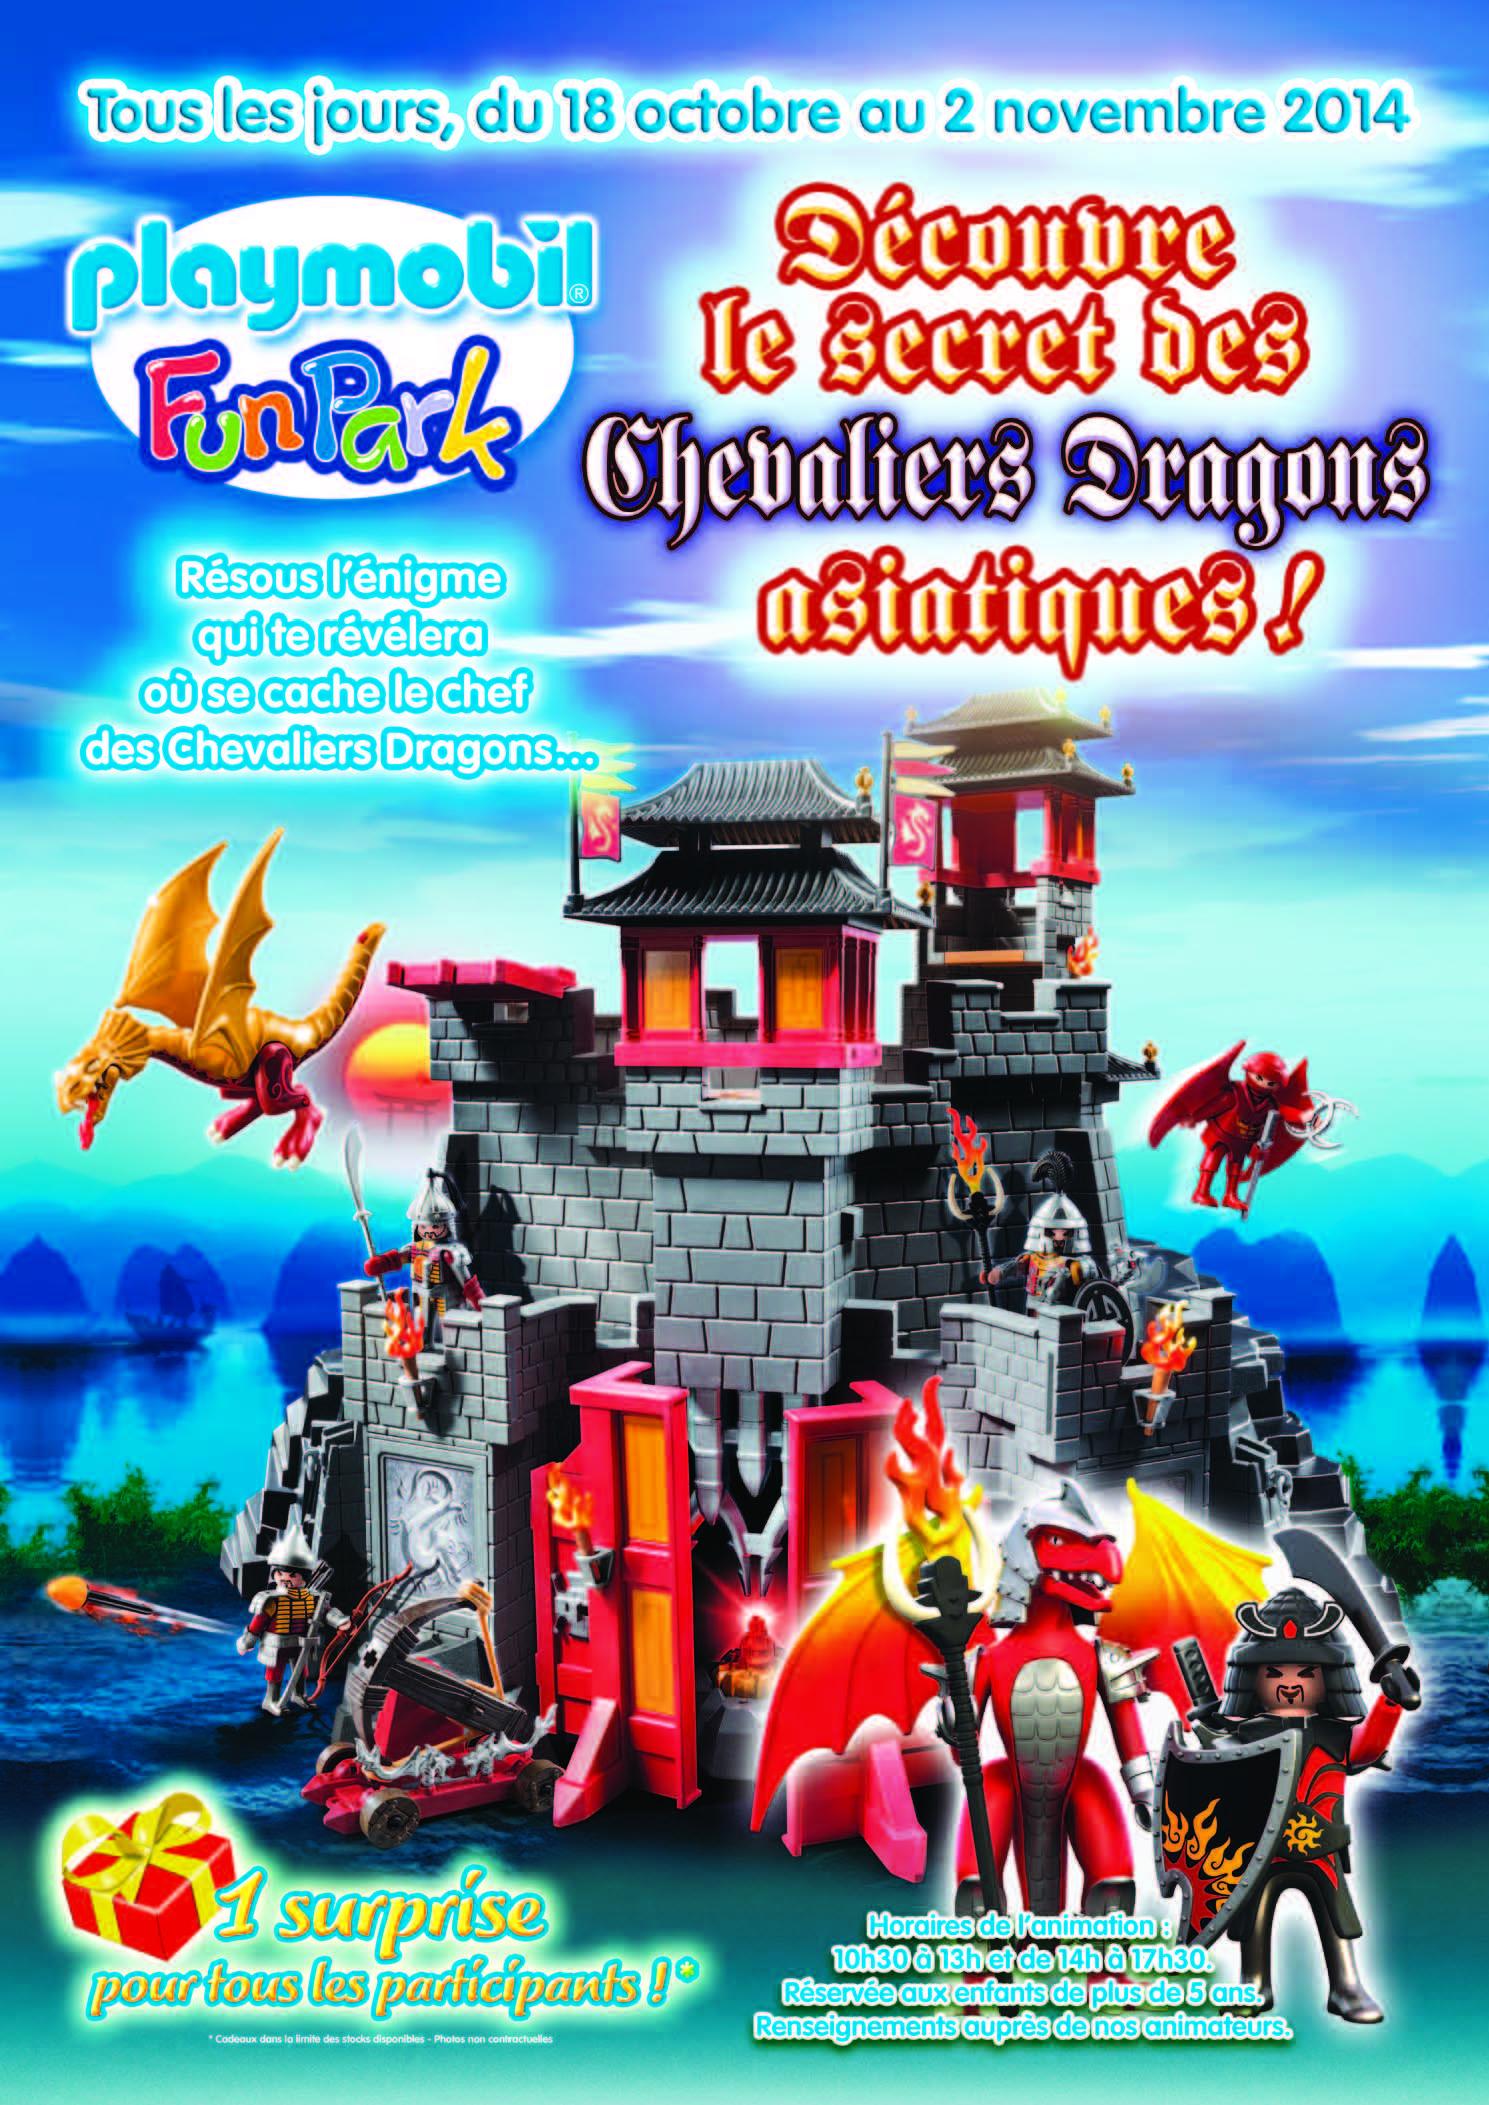 Animation Playmobil FunPark vacances Toussaint 2014)